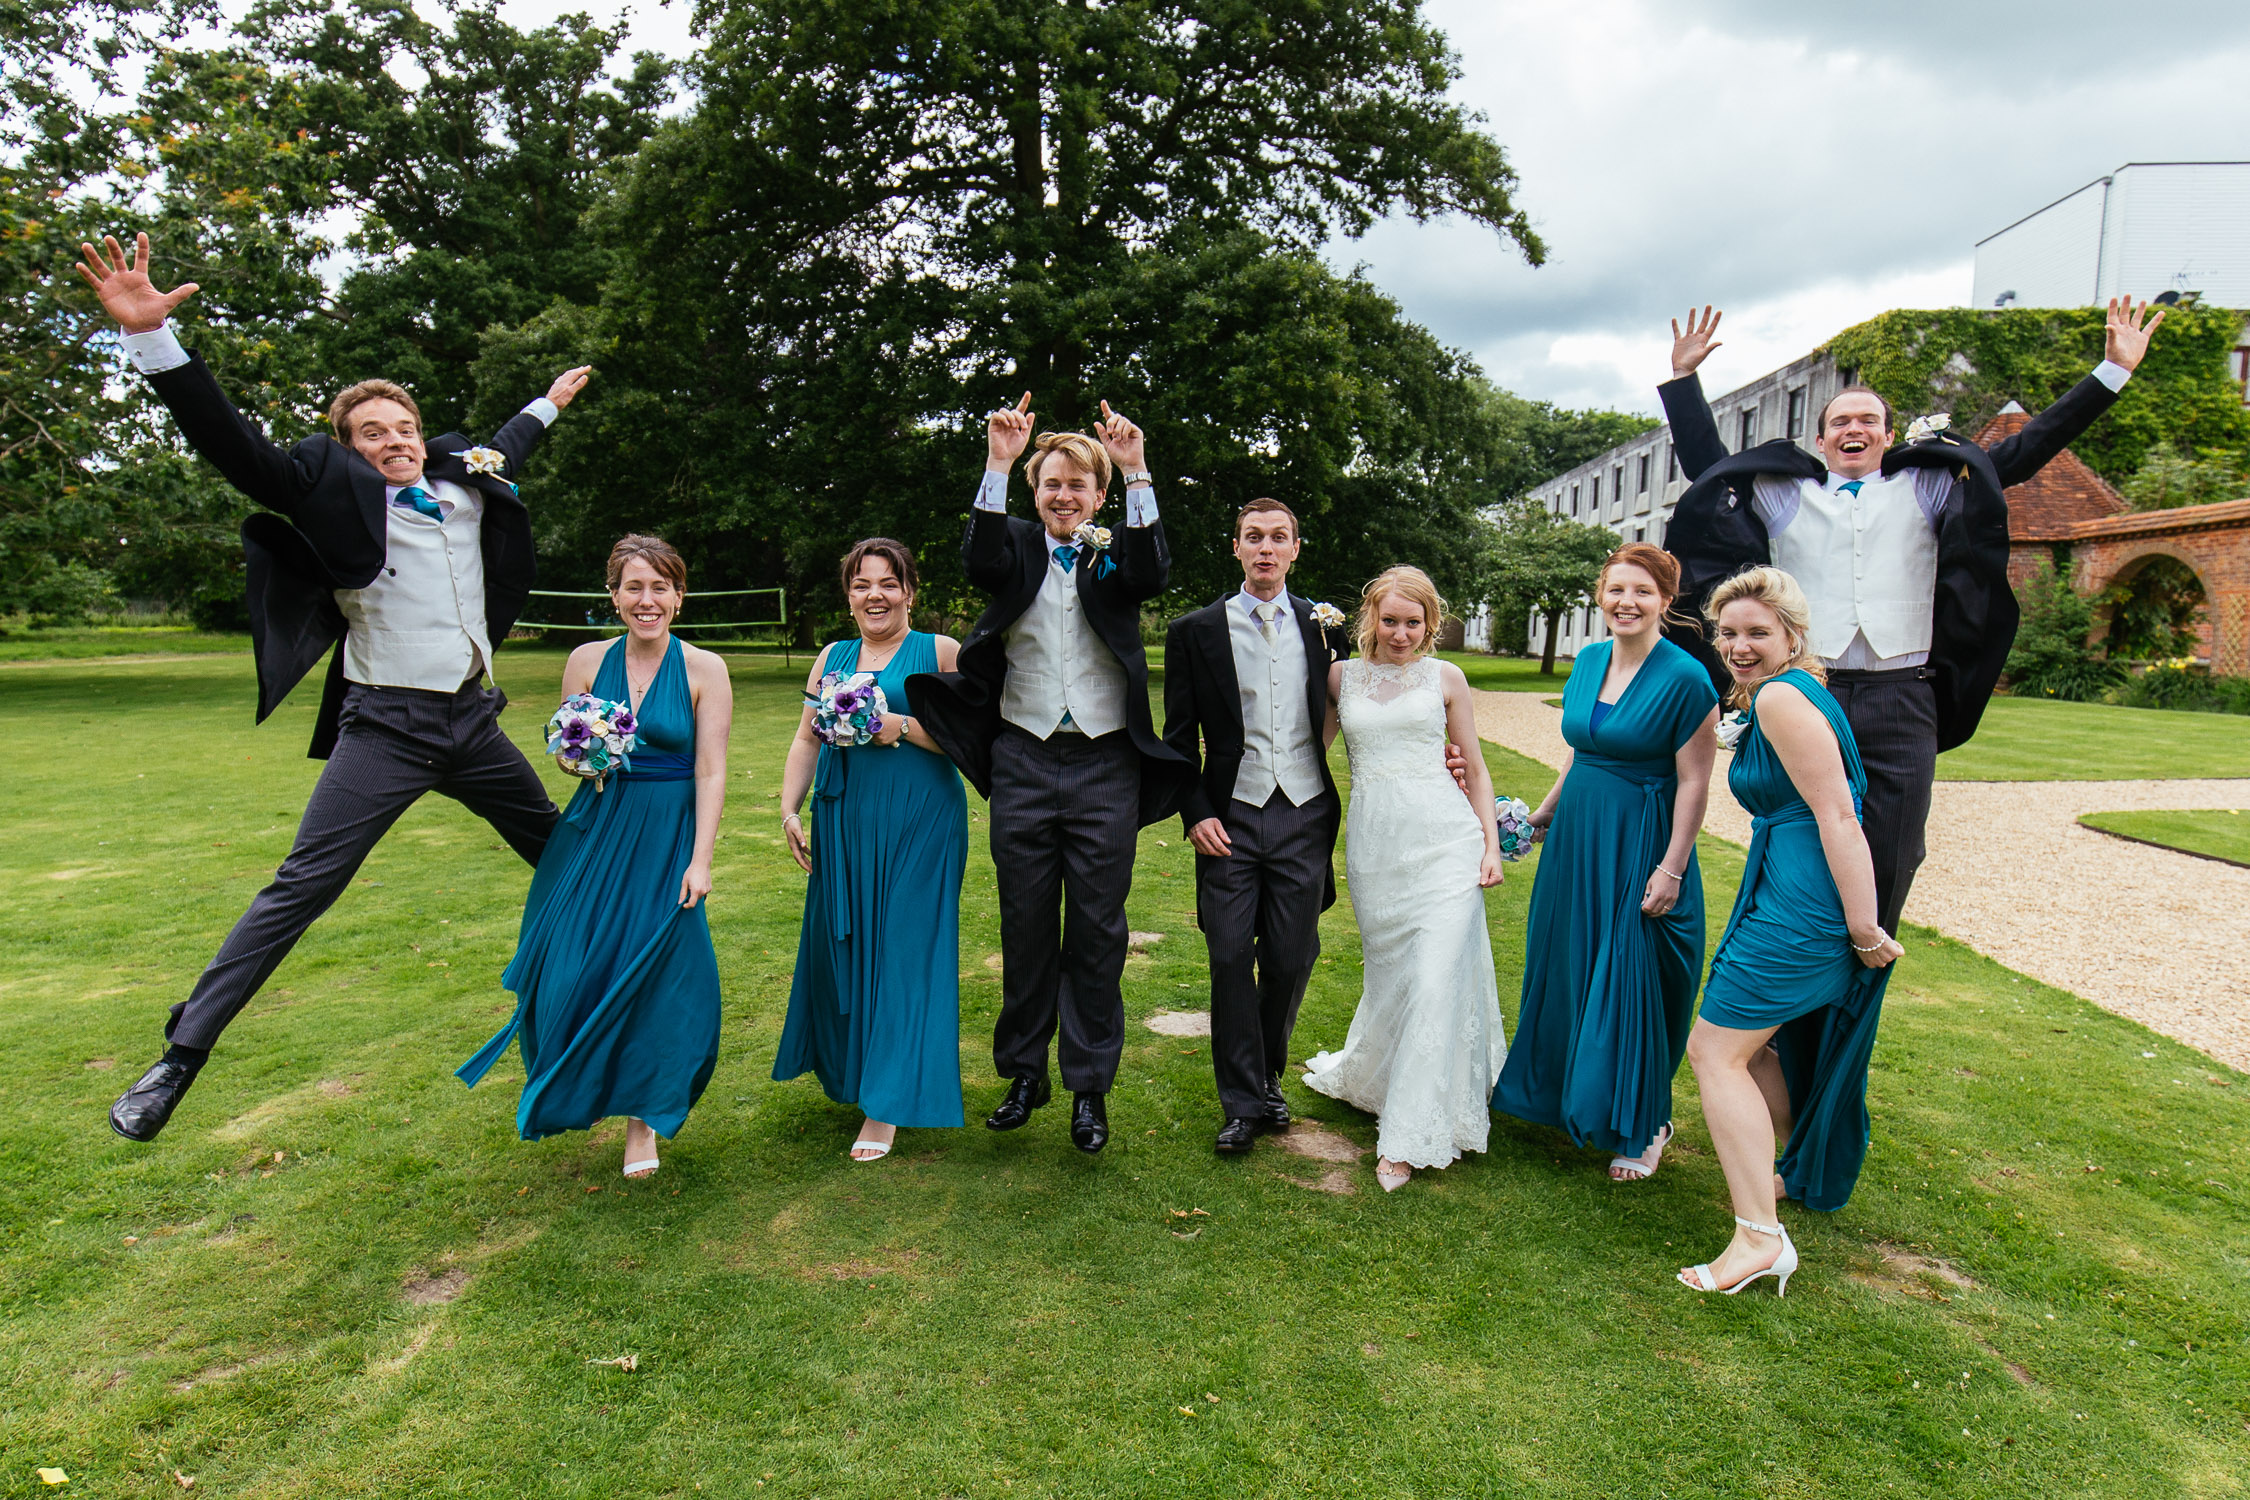 Lizi-and-Mark-Wedding-Highlights-59.jpg